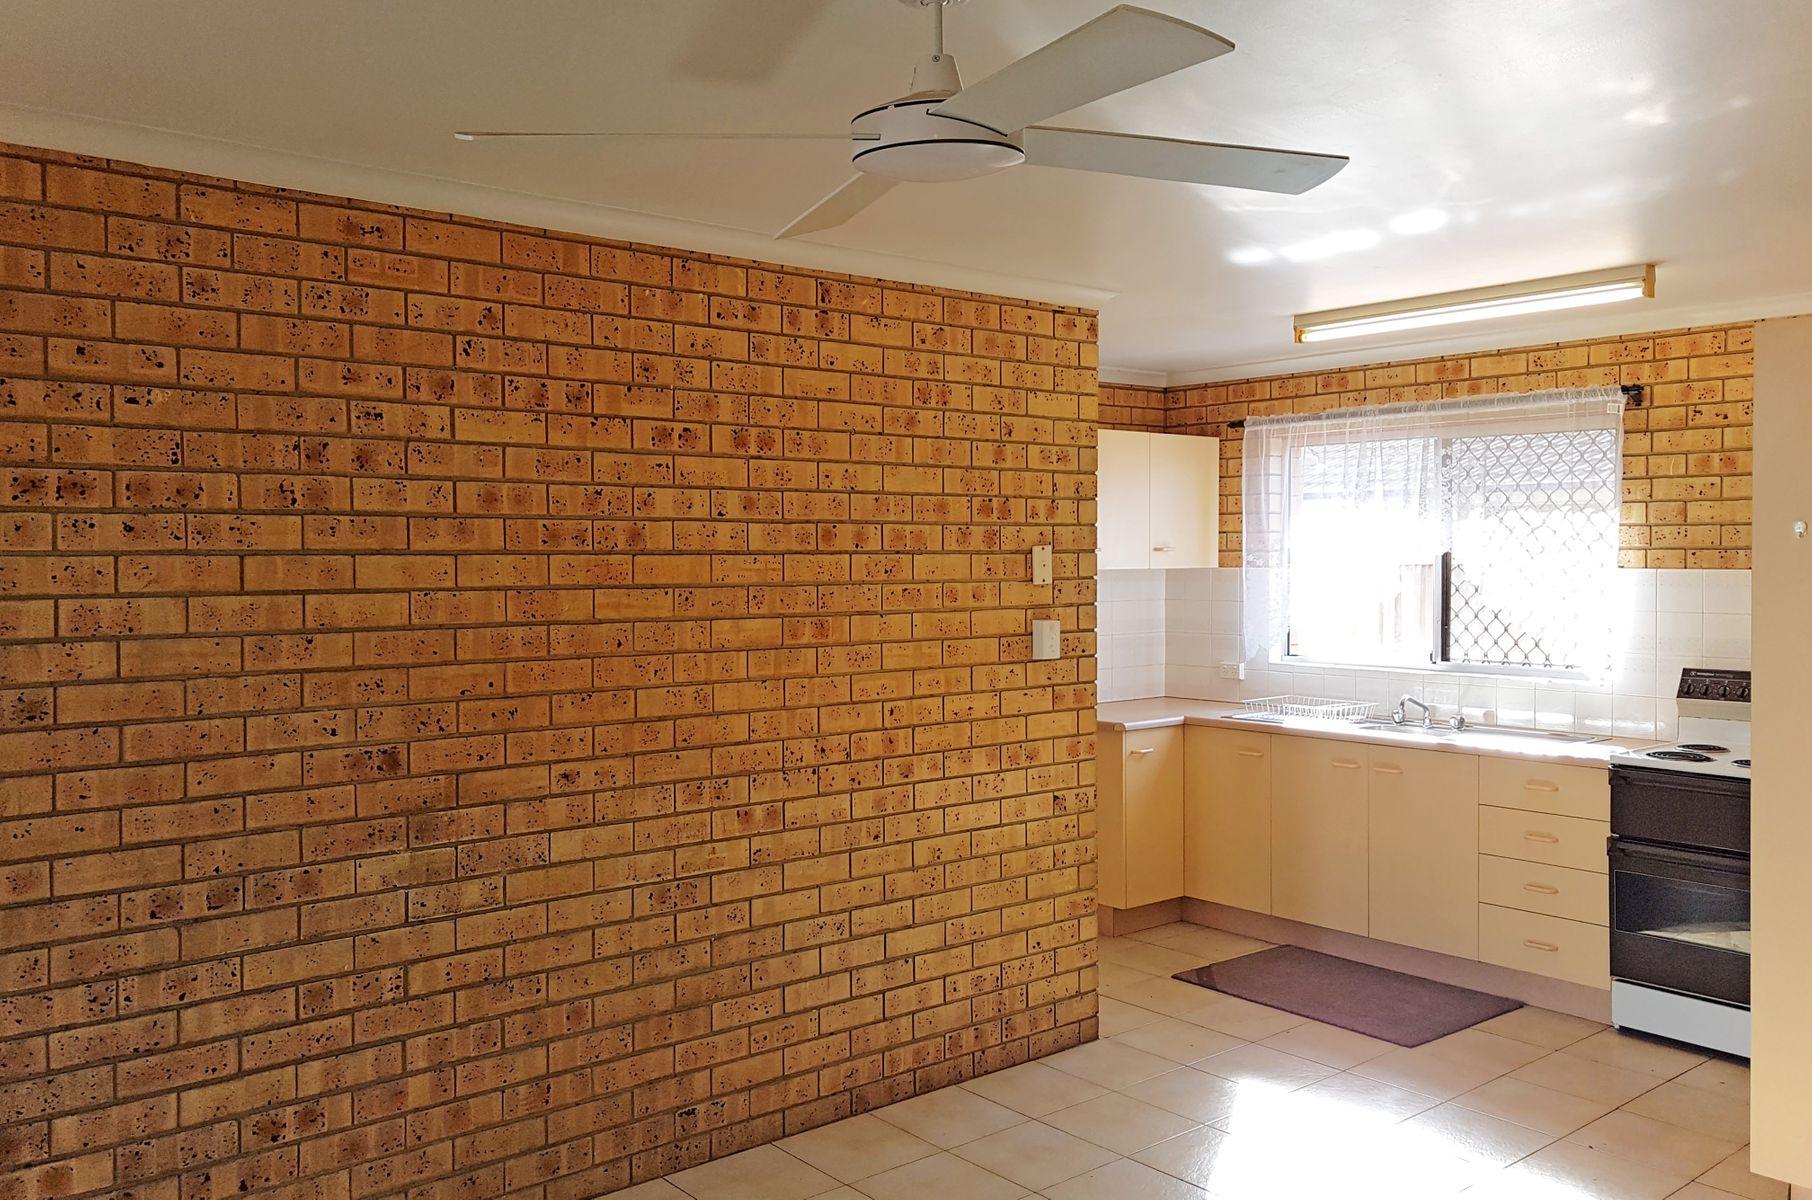 131-133 Targo Street, Bundaberg South, QLD 4670